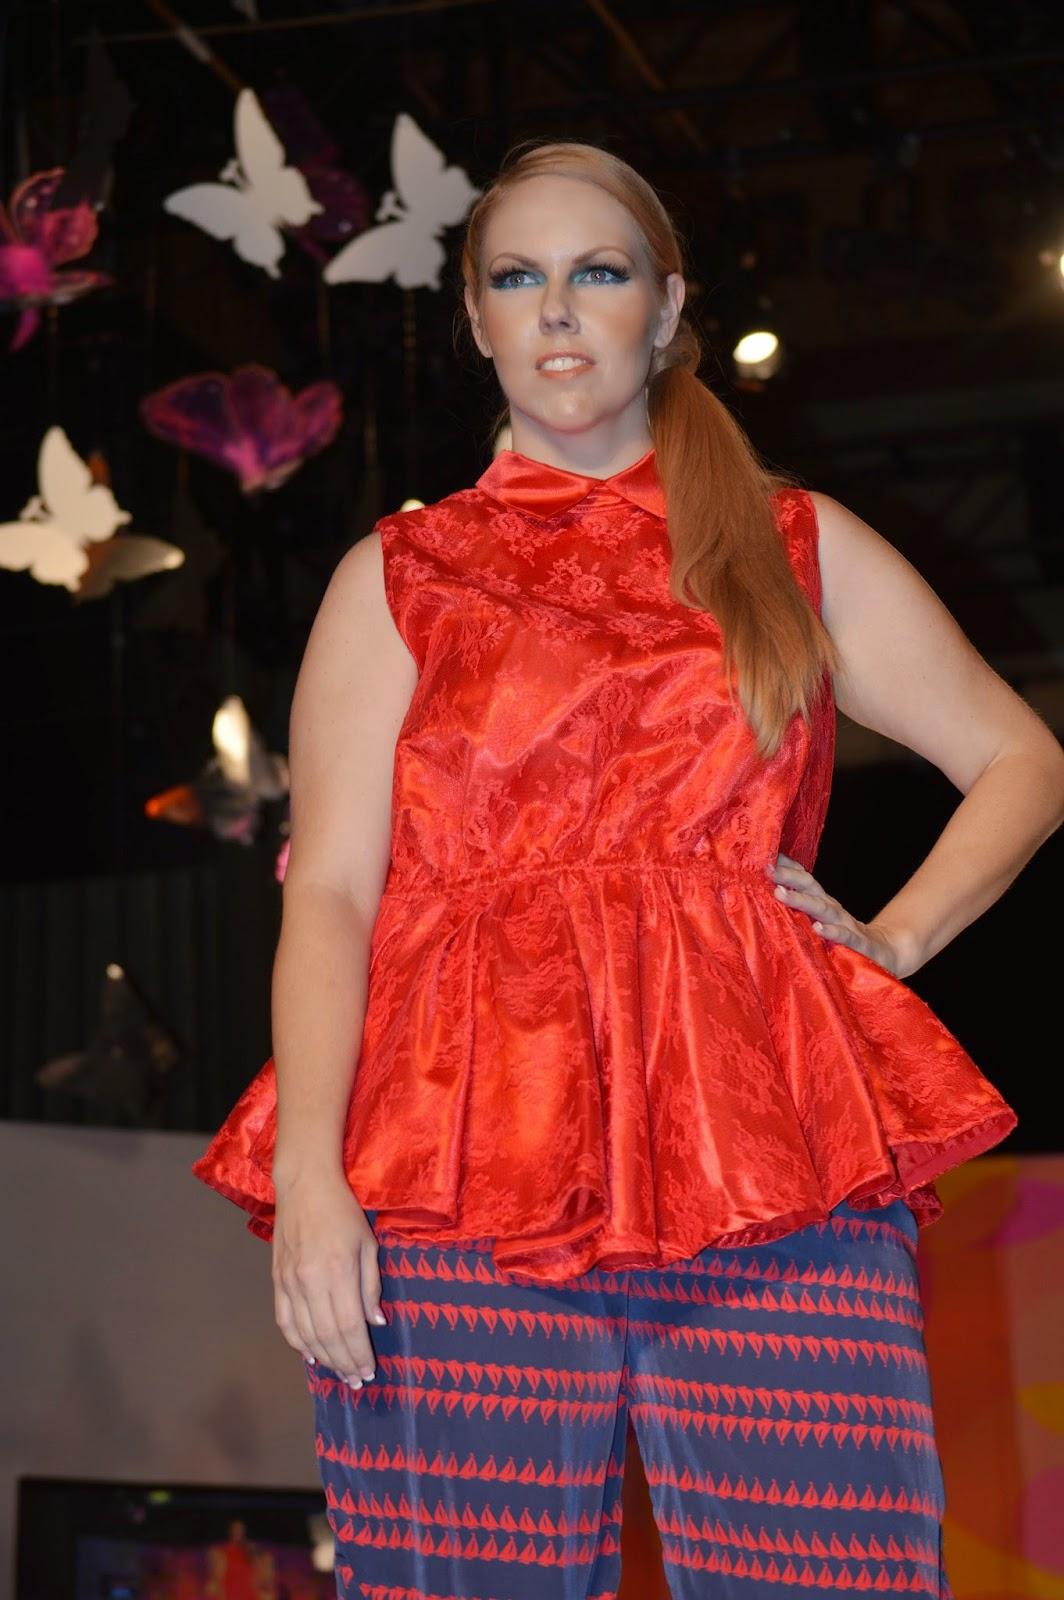 Red Lace Sleeveless Peplum Blouse